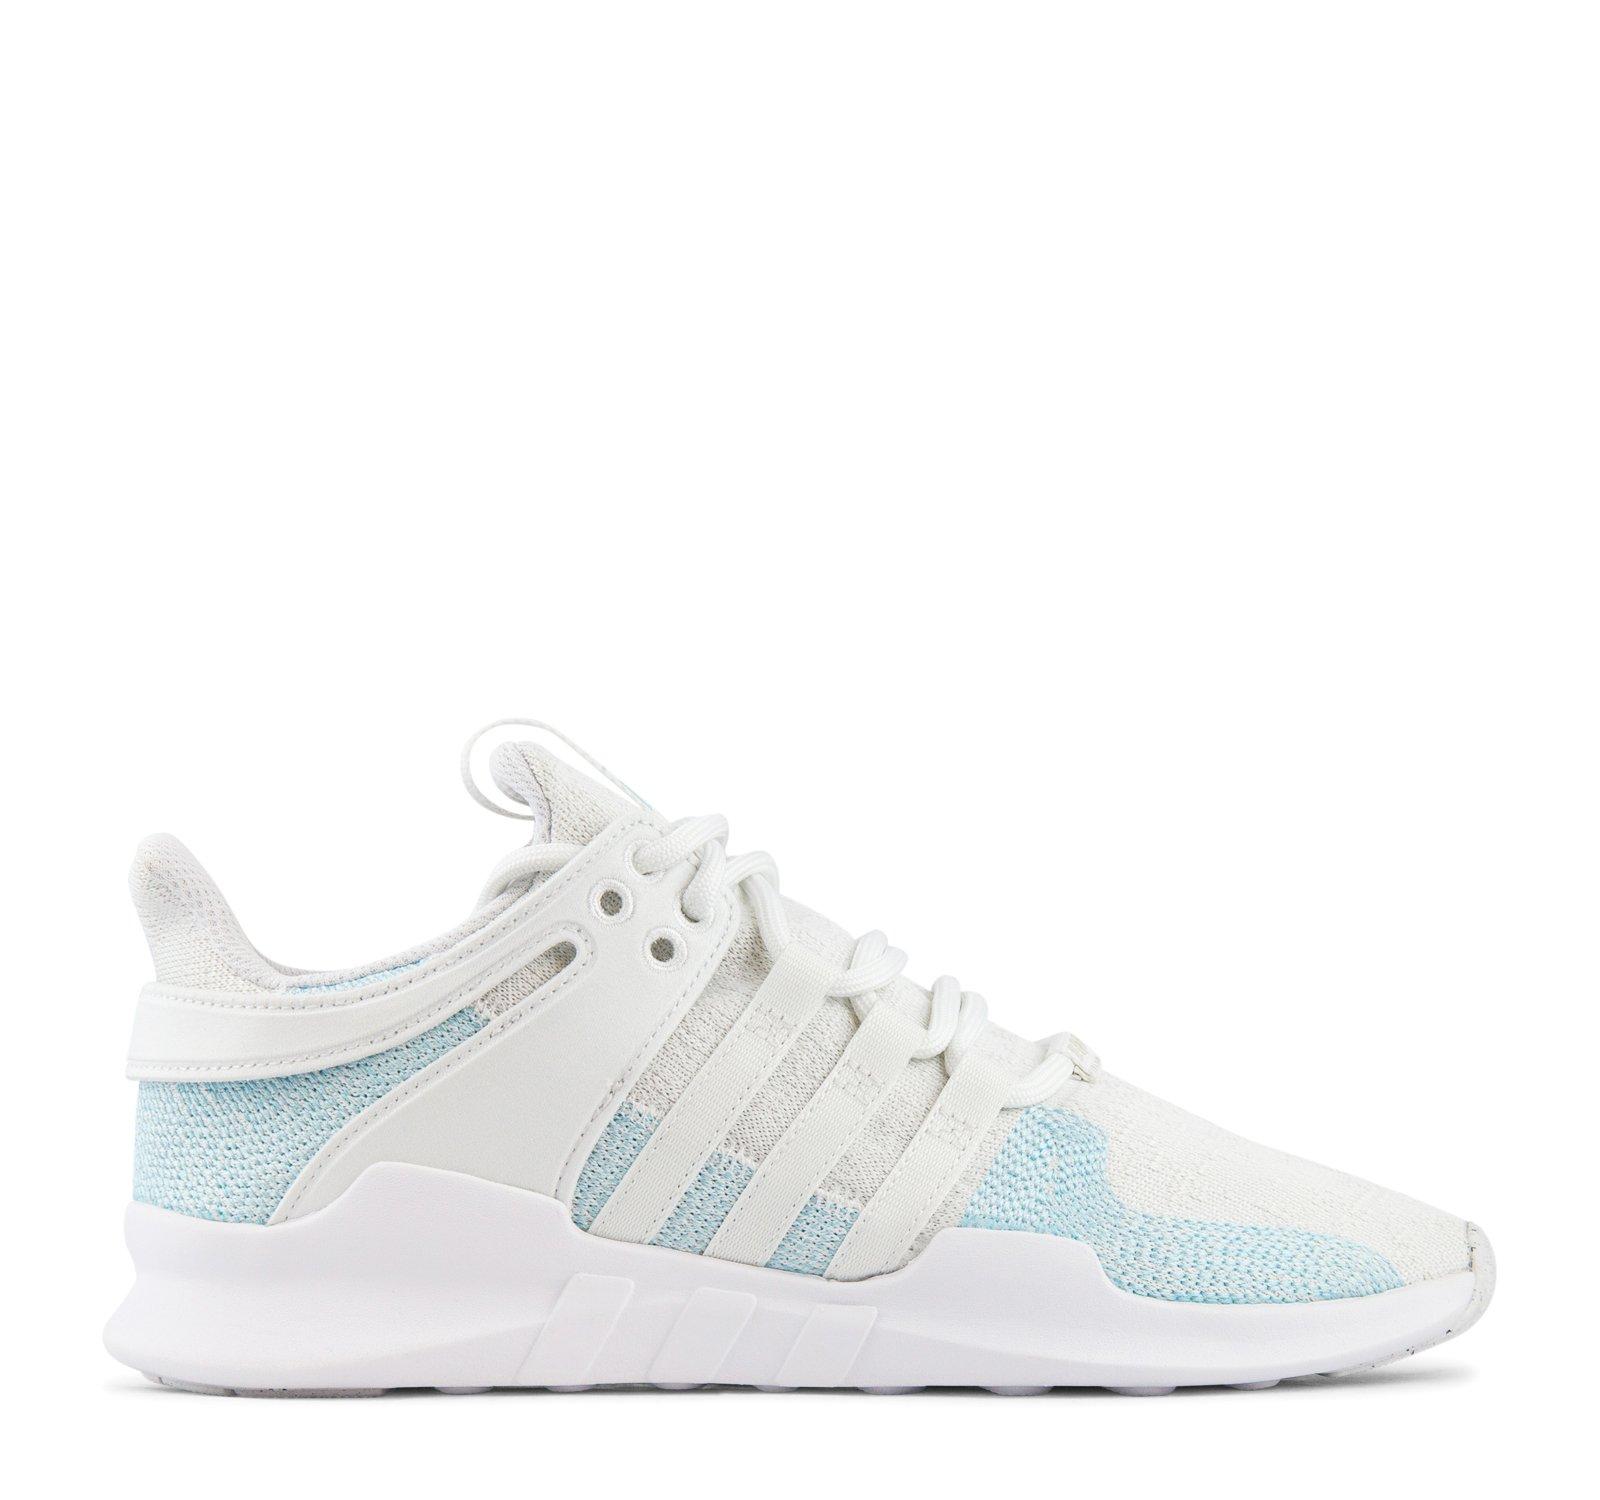 Adidas EQT Support ADV Parley AC7804 - White Blue  3ef0a5f43